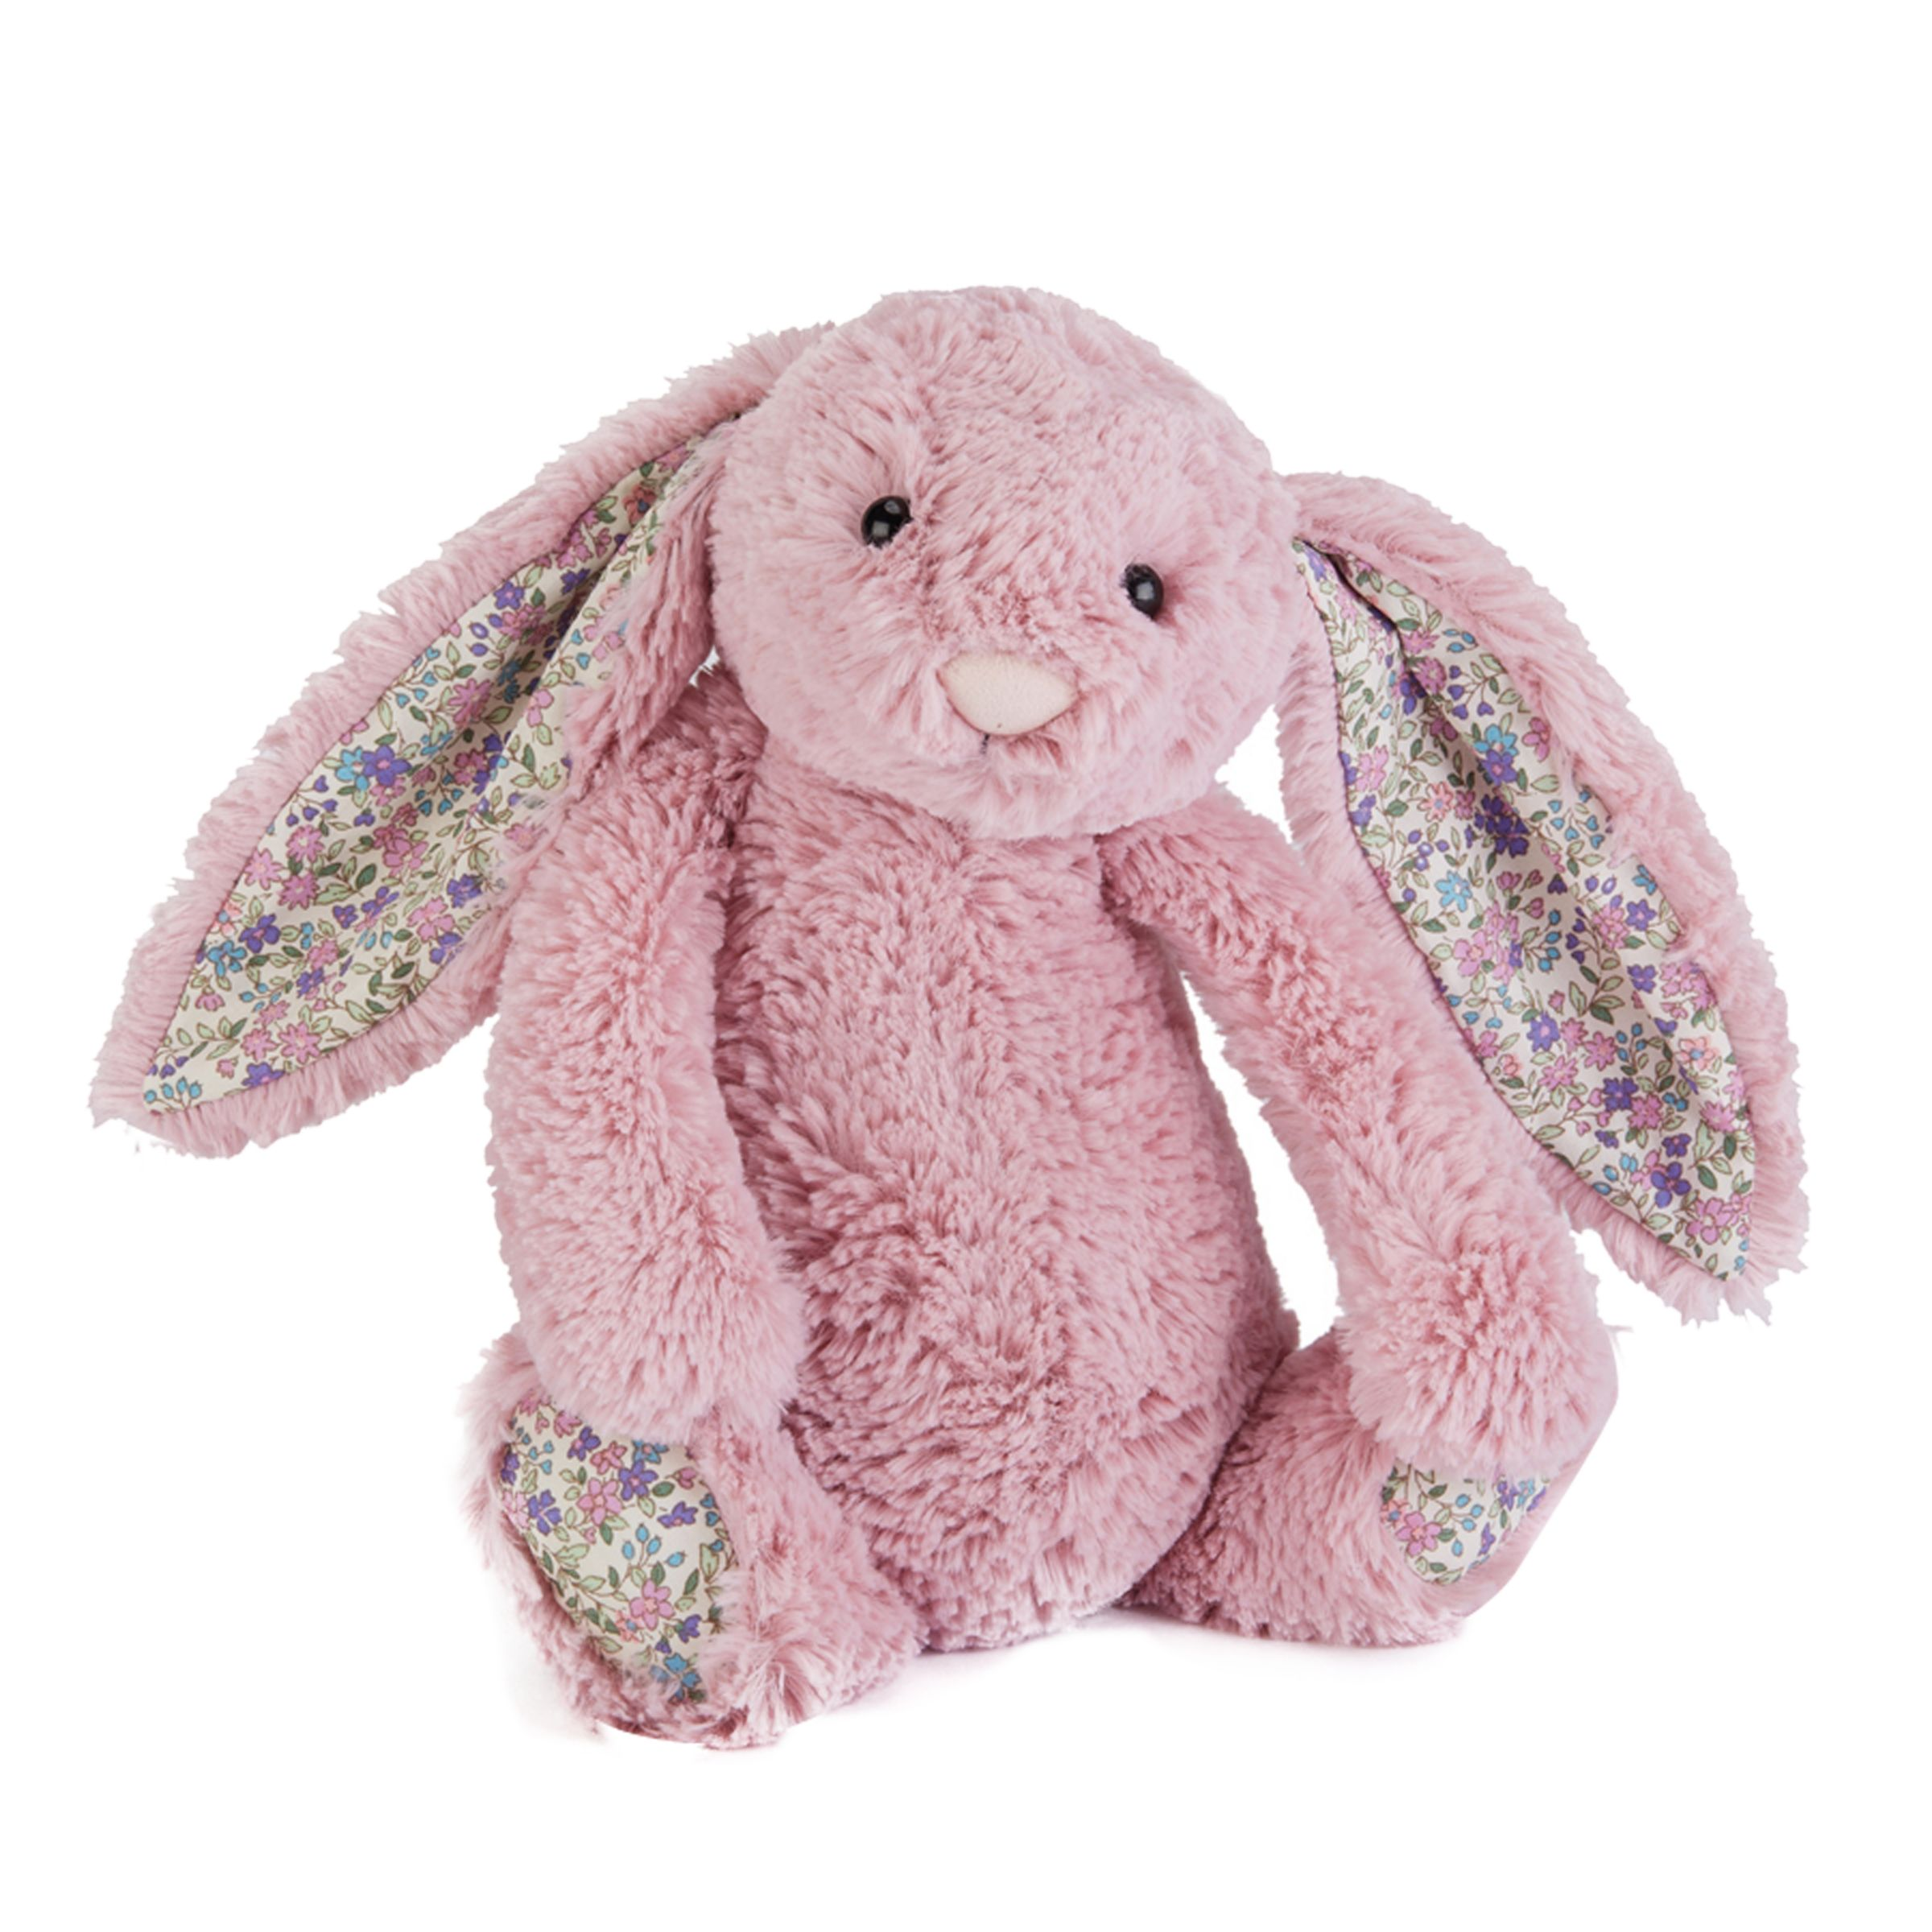 Jellycat Jellycat Blossom Bunny Soft Toy, Small, Pink